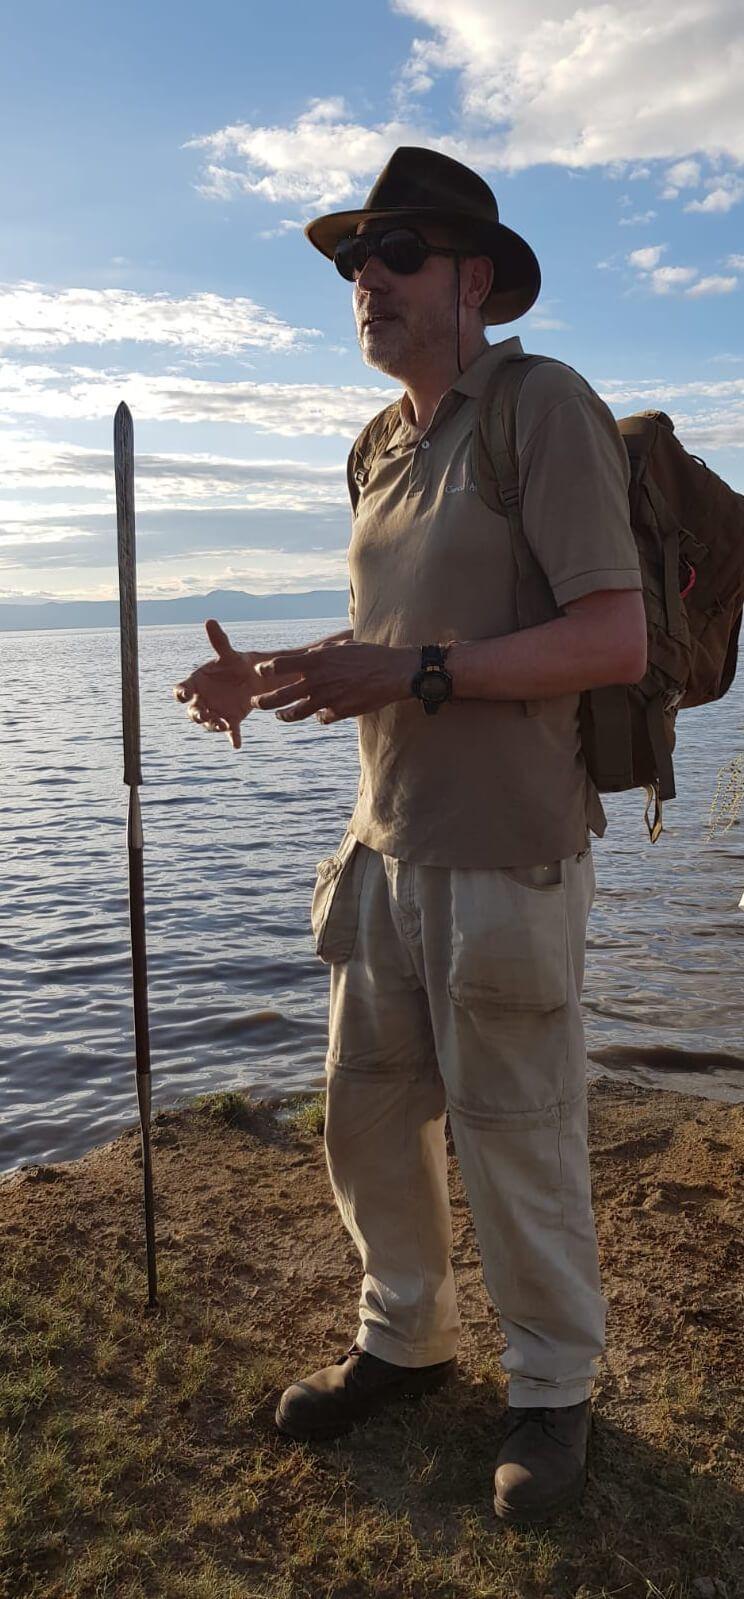 Jordi Serrallonga en la Gran Falla del Rift